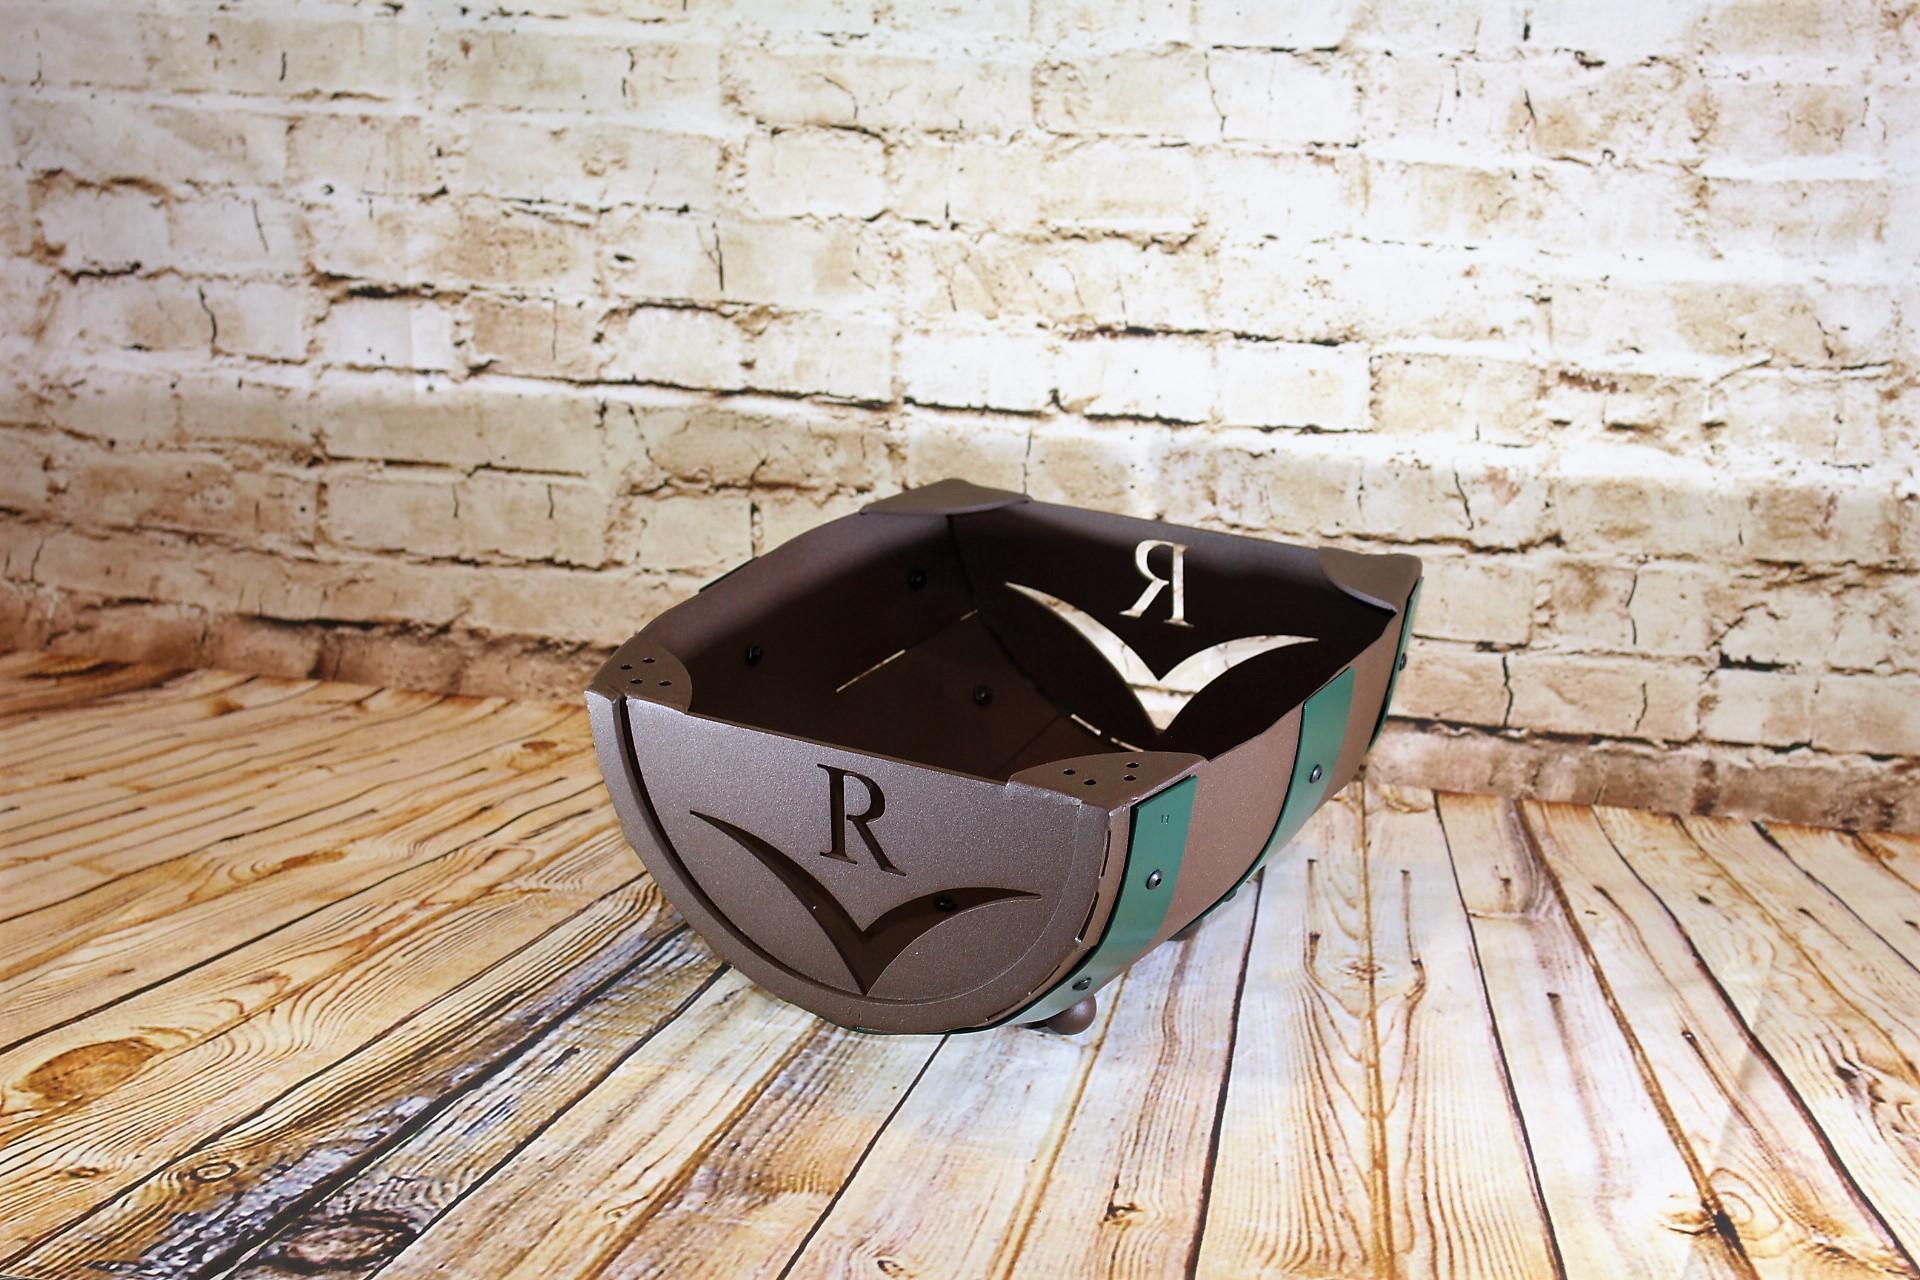 Ball Barrel Basket -Raritan